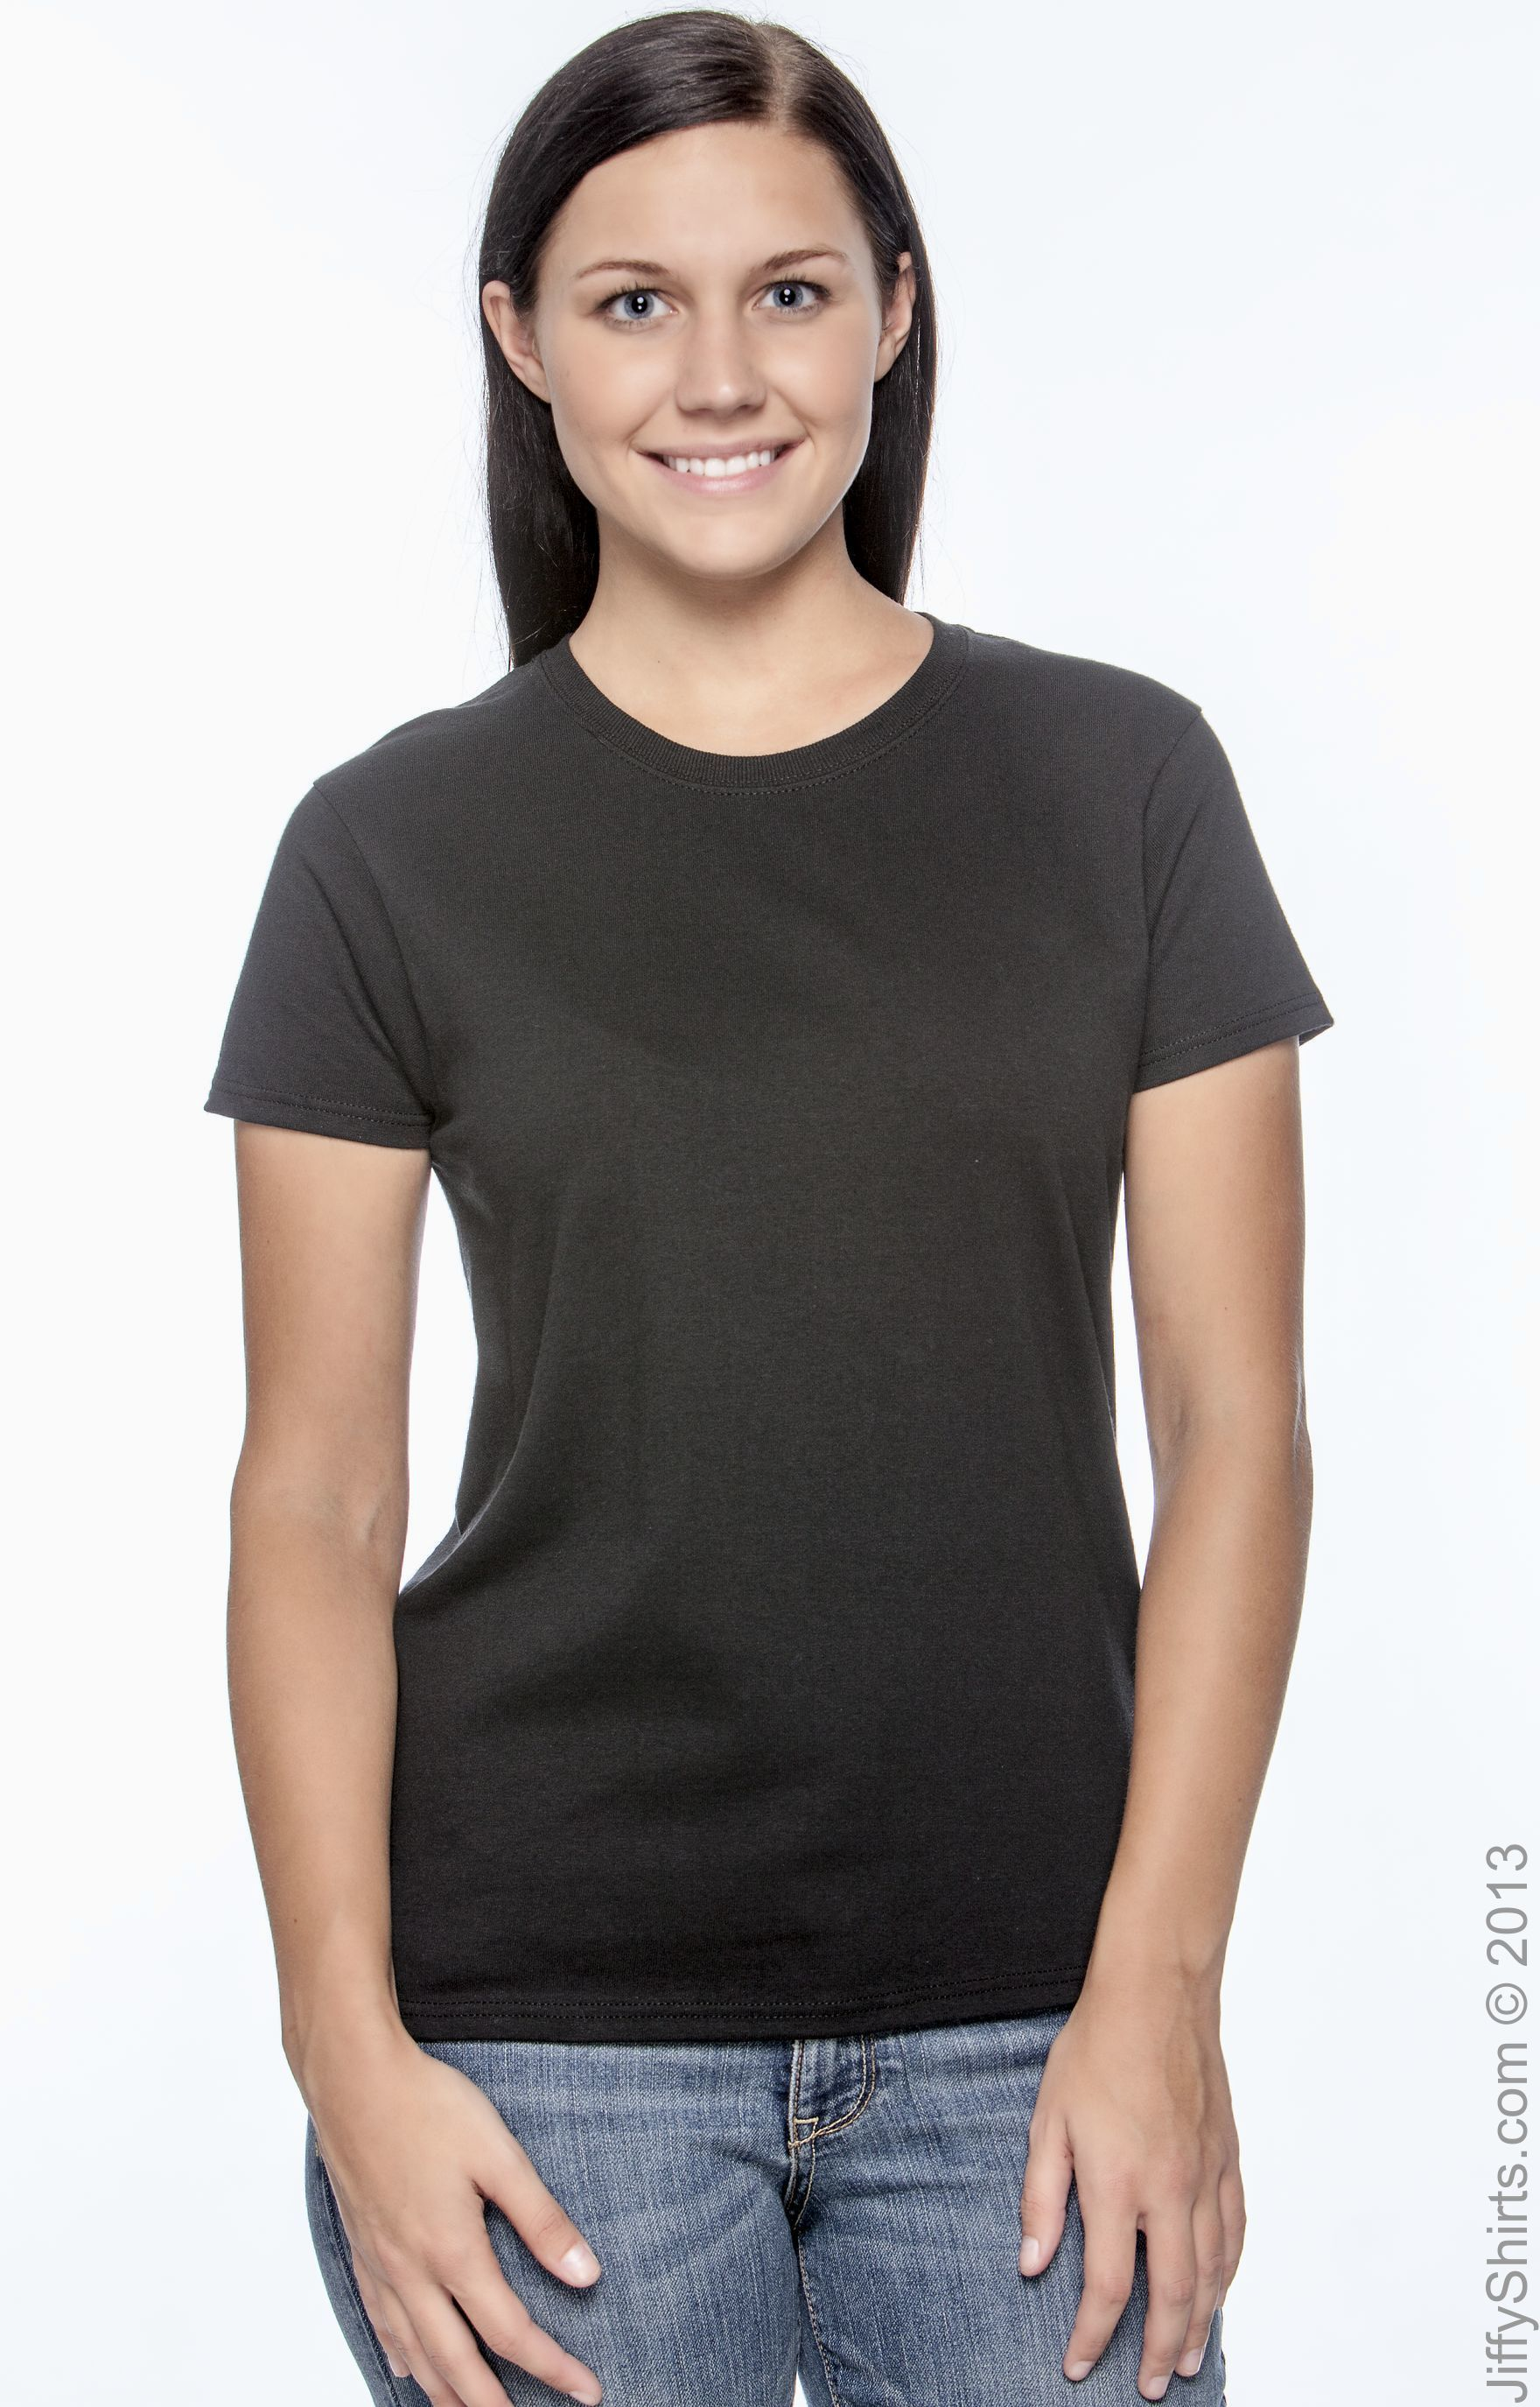 Plain Gildan Tshirt 100/% Preshrunk Cotton Ladies Fashion Women Tee Shirt T-shirt